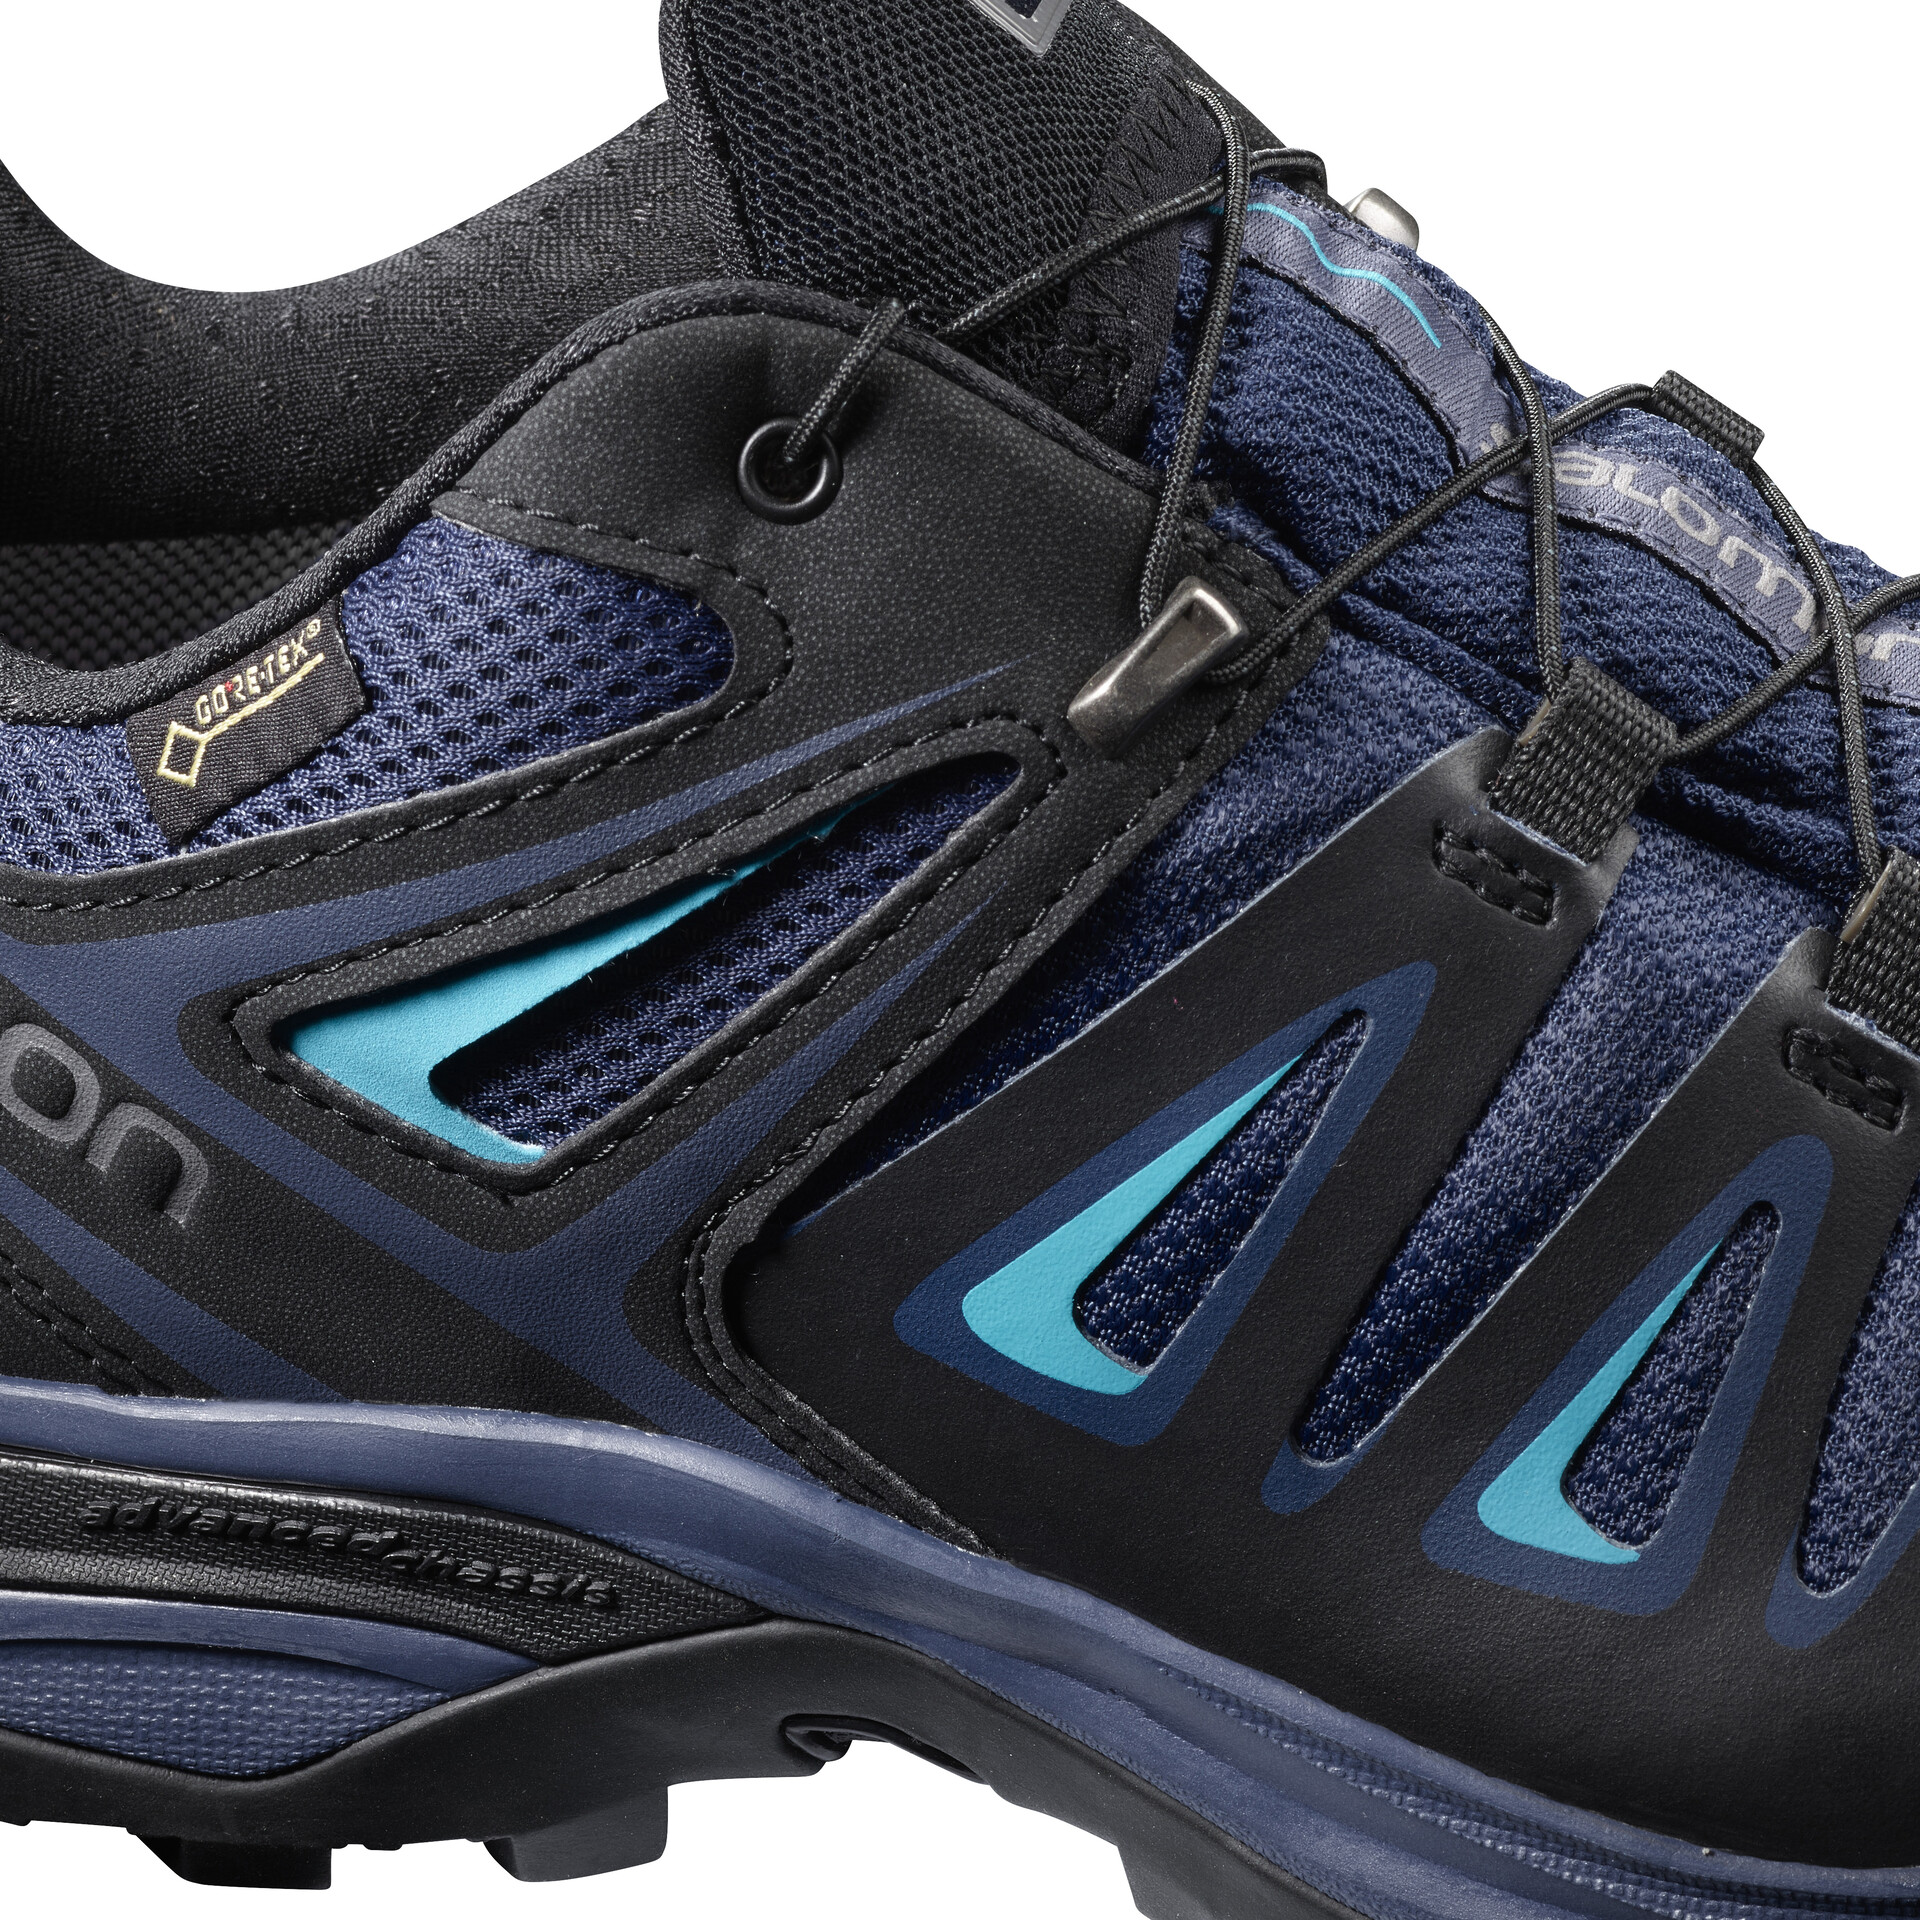 Salomon X Ultra 3 GTX Chaussures de randonnée Femme, medieval blueblackhawaiian surf